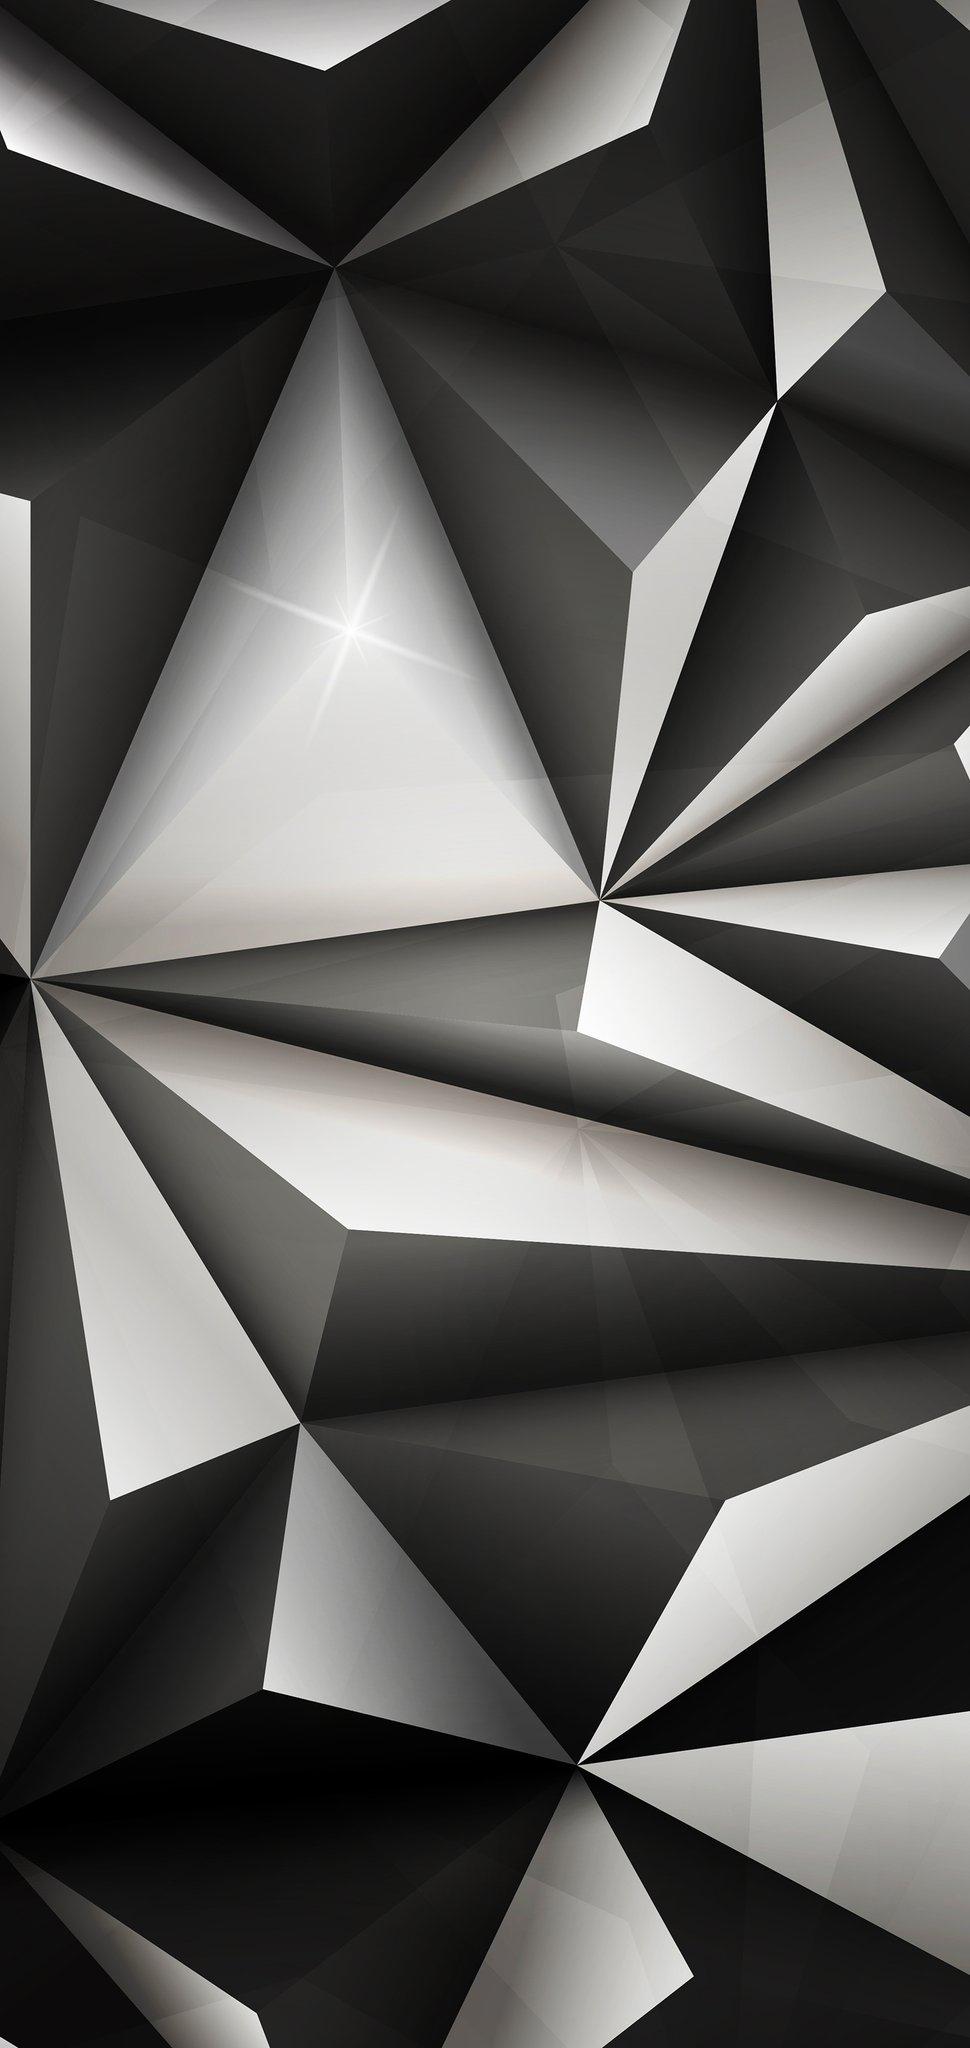 Abstract geometric iPhone wallpaper ieditwalls iDownloadBlog 3